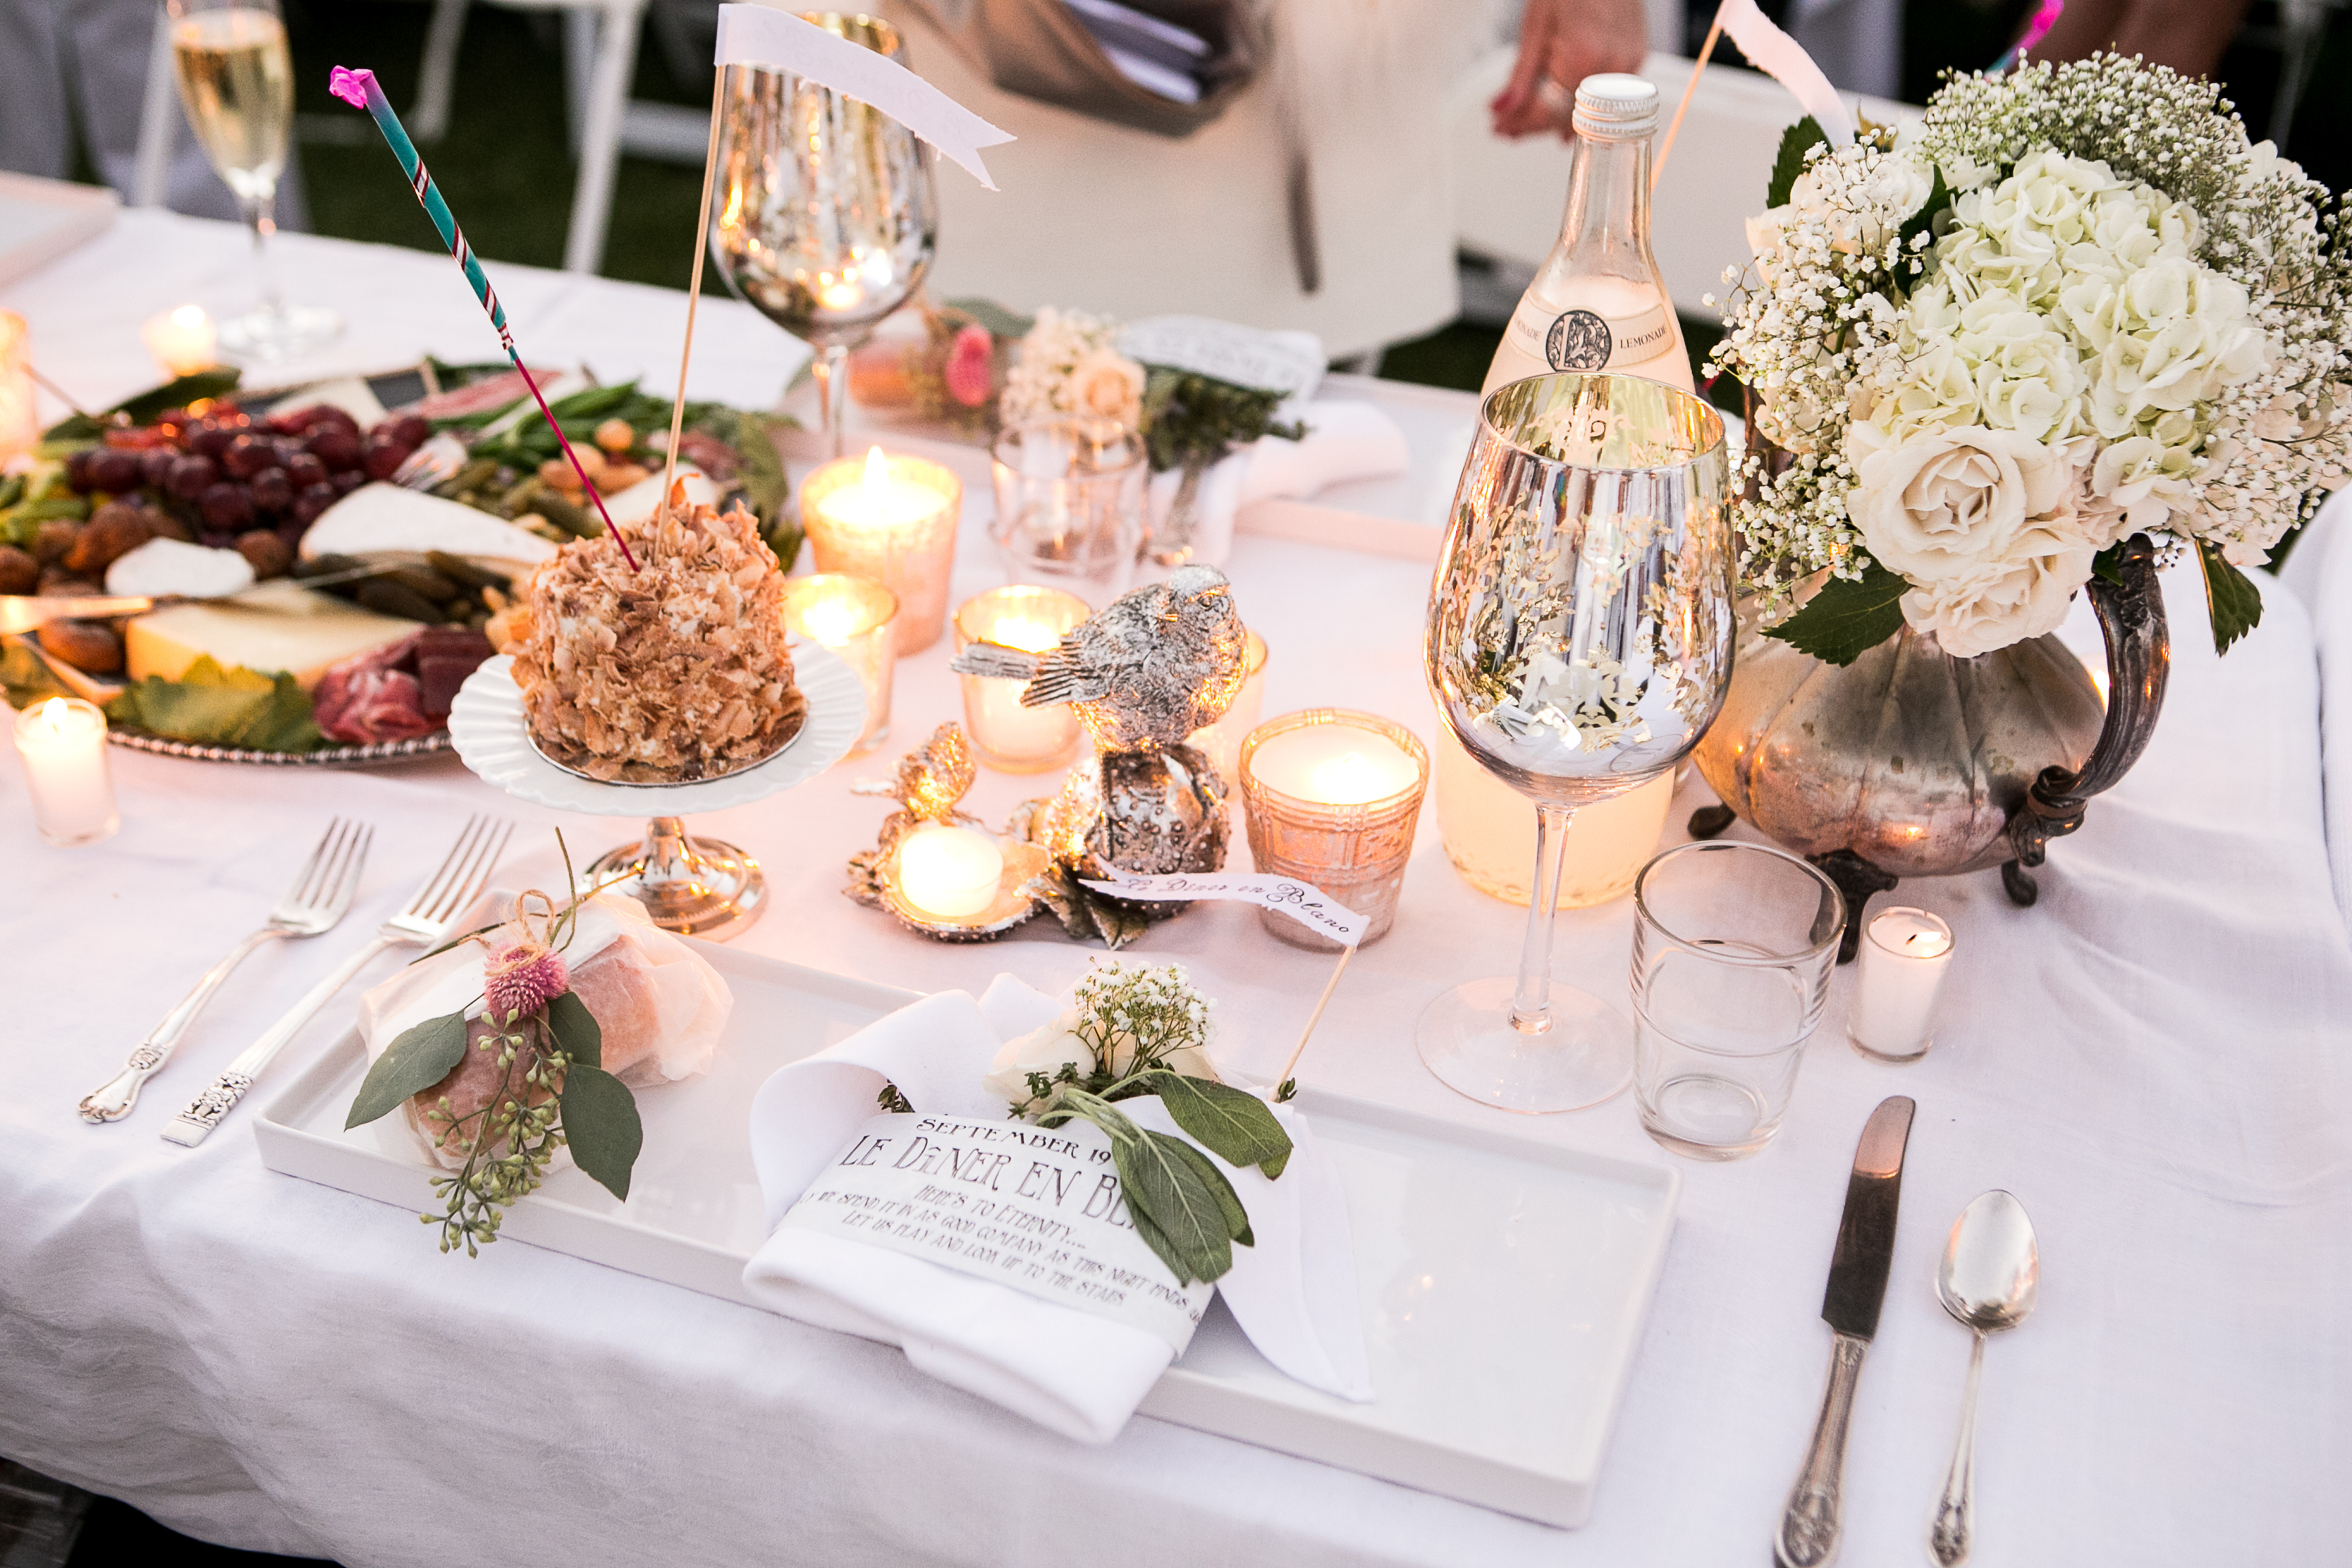 D 238 Ner En Blanc Orlando Best Dressed Table Contest